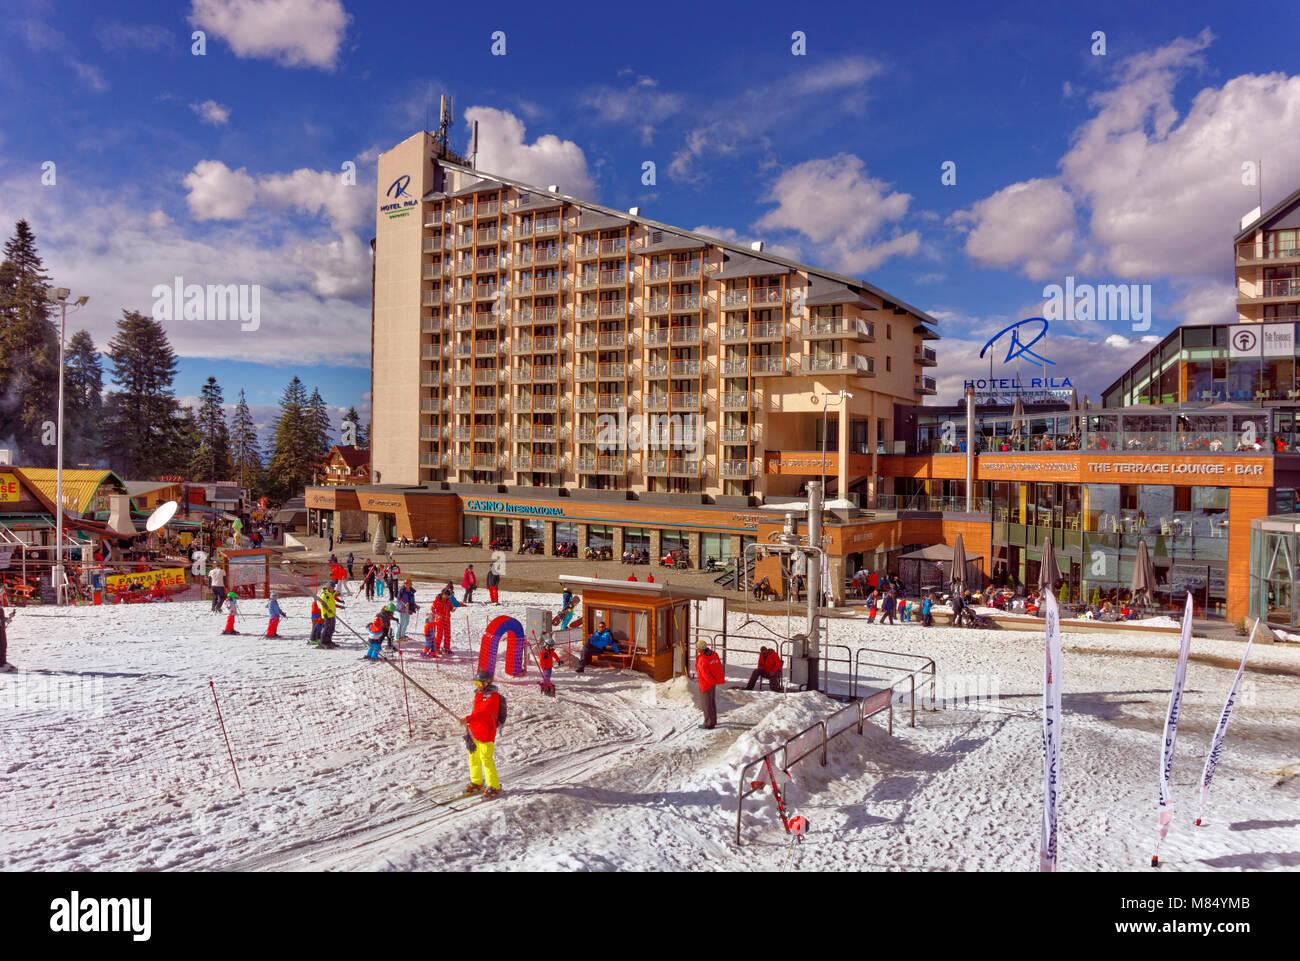 Rila Hotel and beginners drag lift at Borovets Ski resort, Targovishte, Bulgaria. - Stock Image